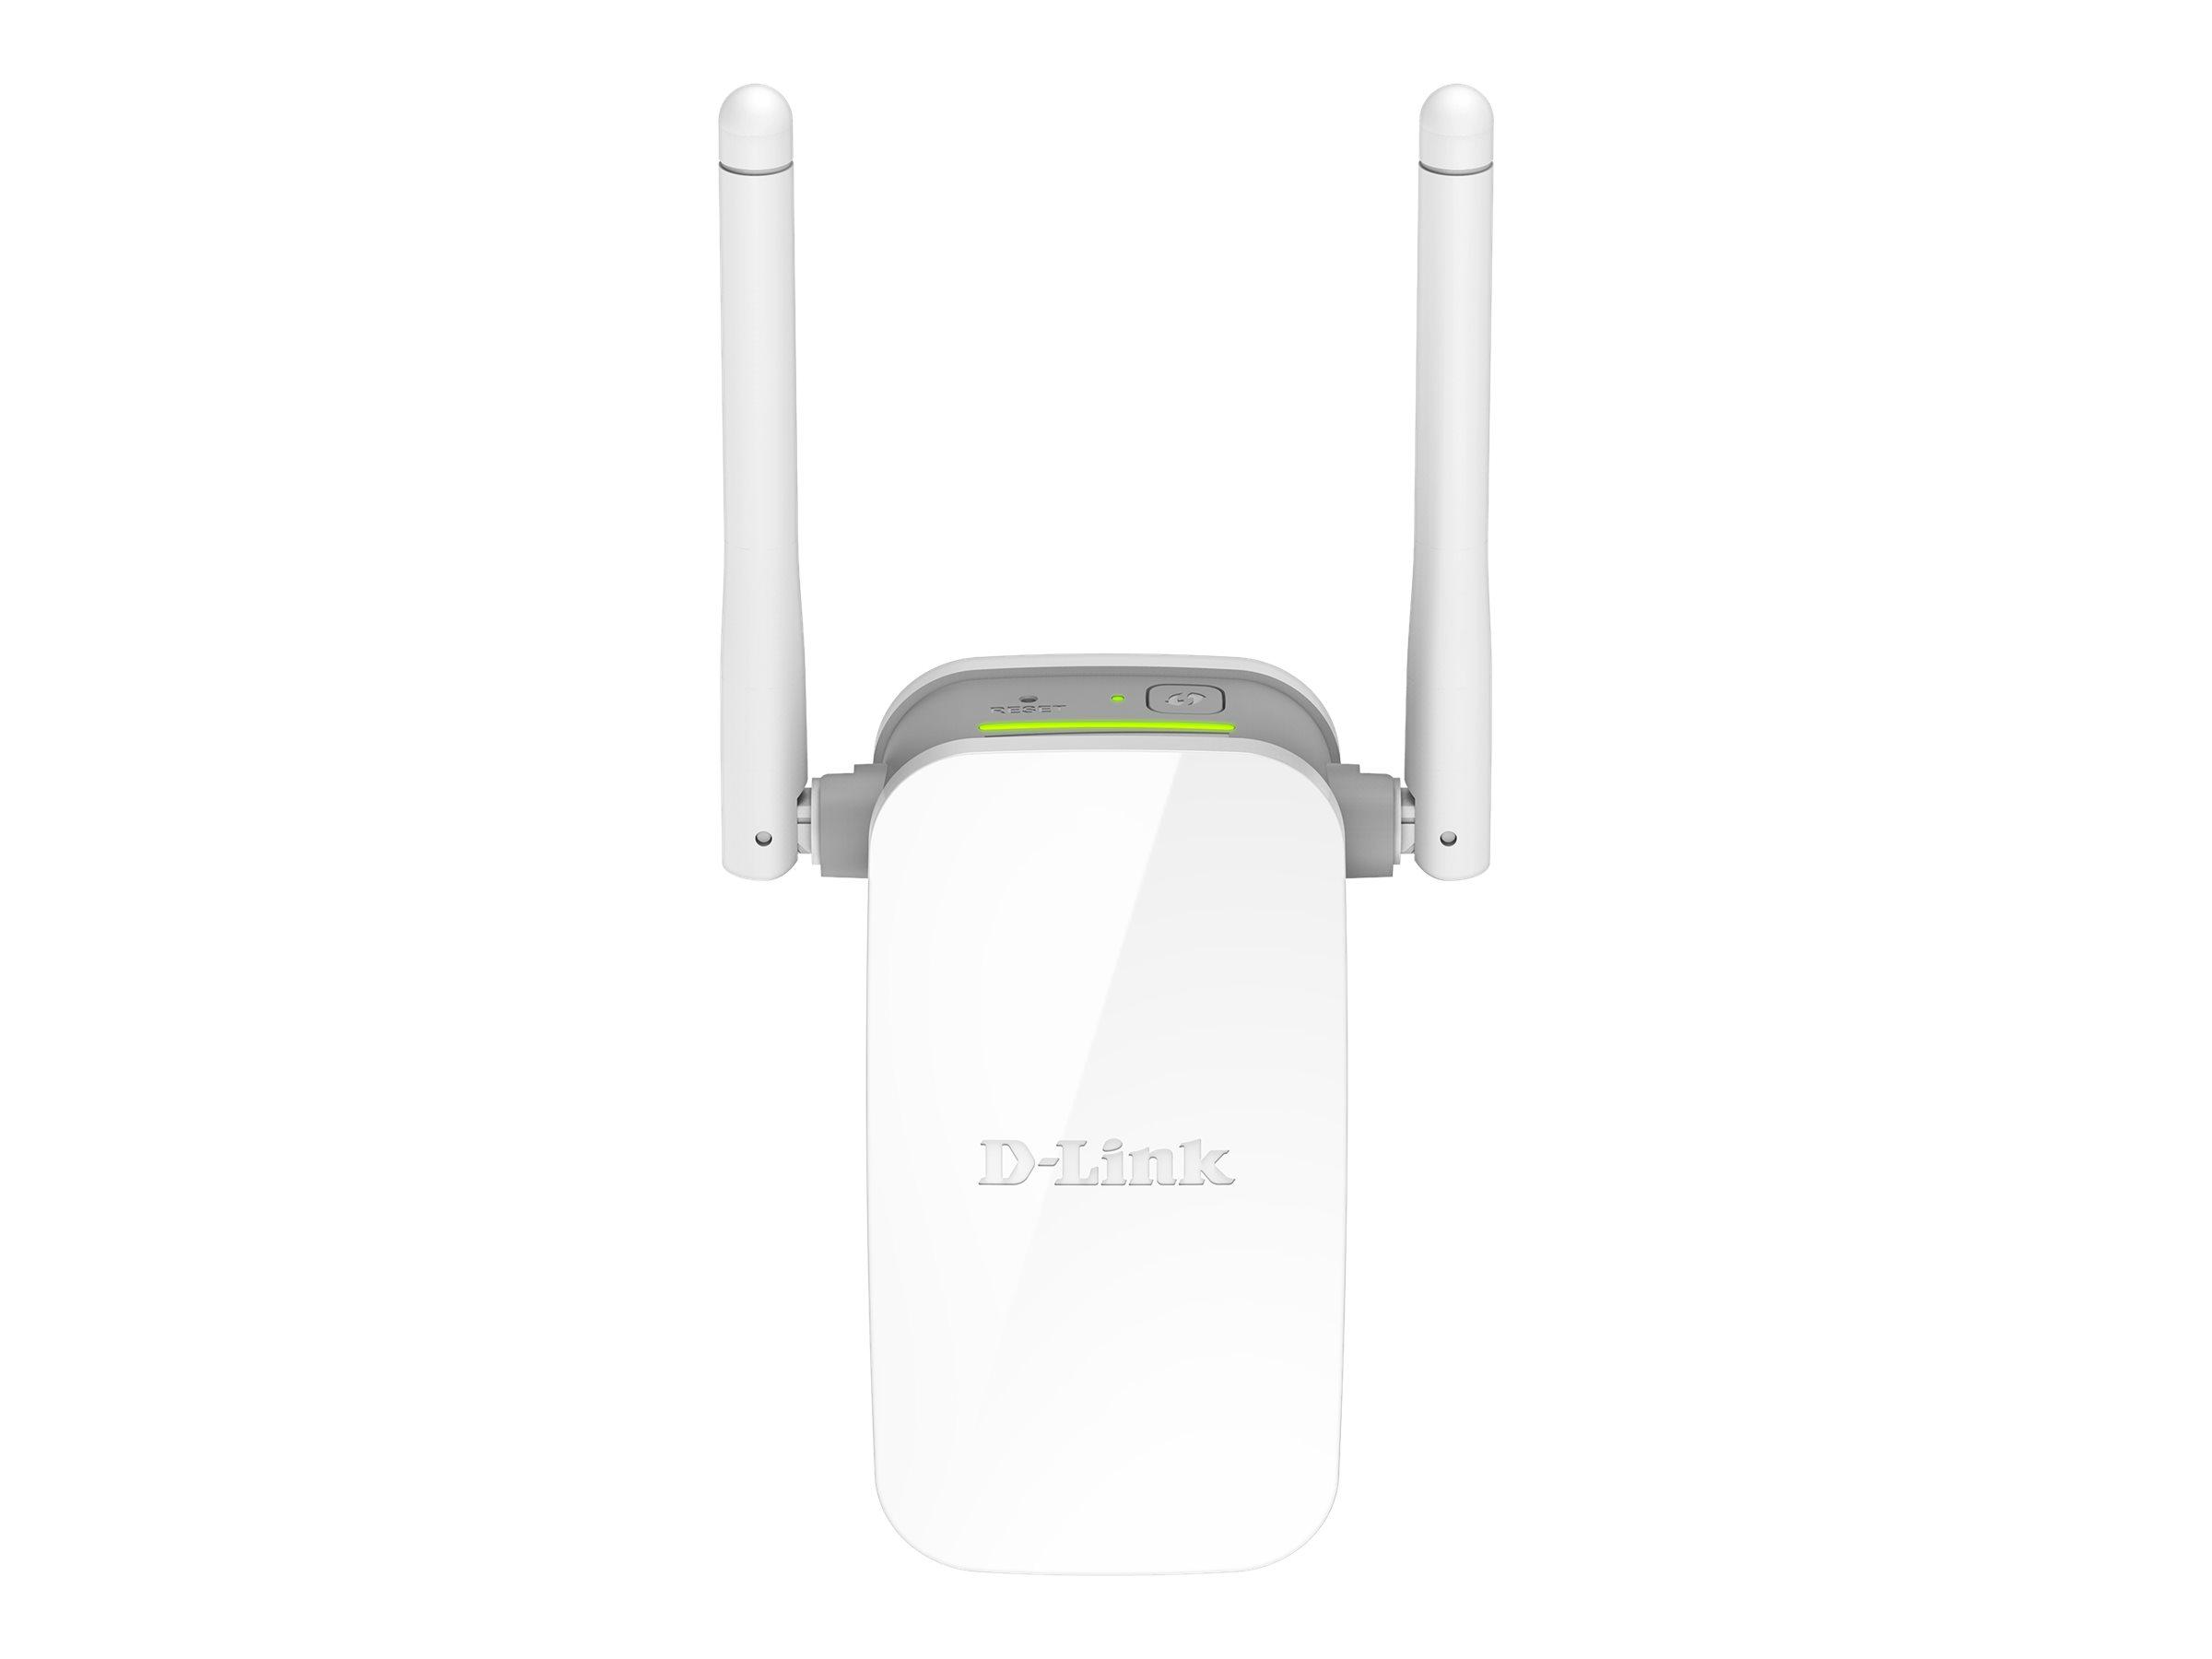 Vorschau: D-Link DAP-1325 N300 - Wi-Fi-Range-Extender - 100Mb LAN